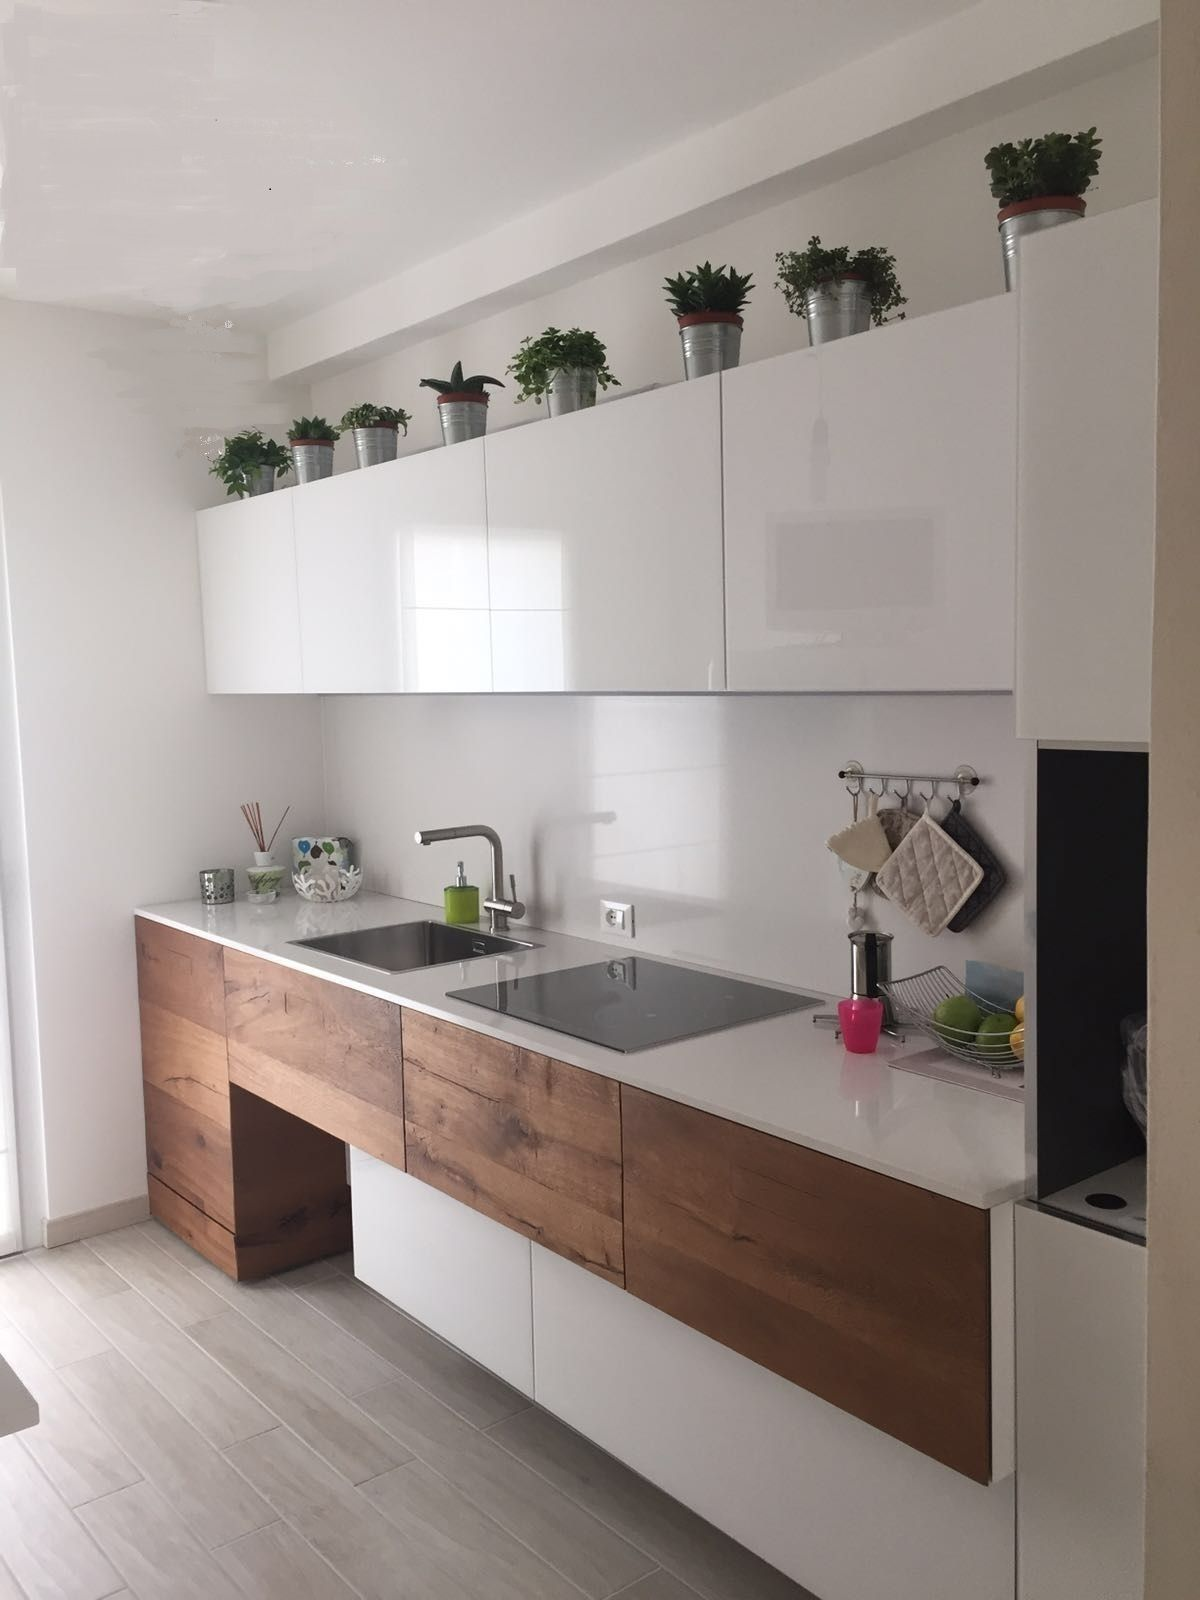 Risultati immagini per cucina moderna bianca e legno chiaro | cucina ...